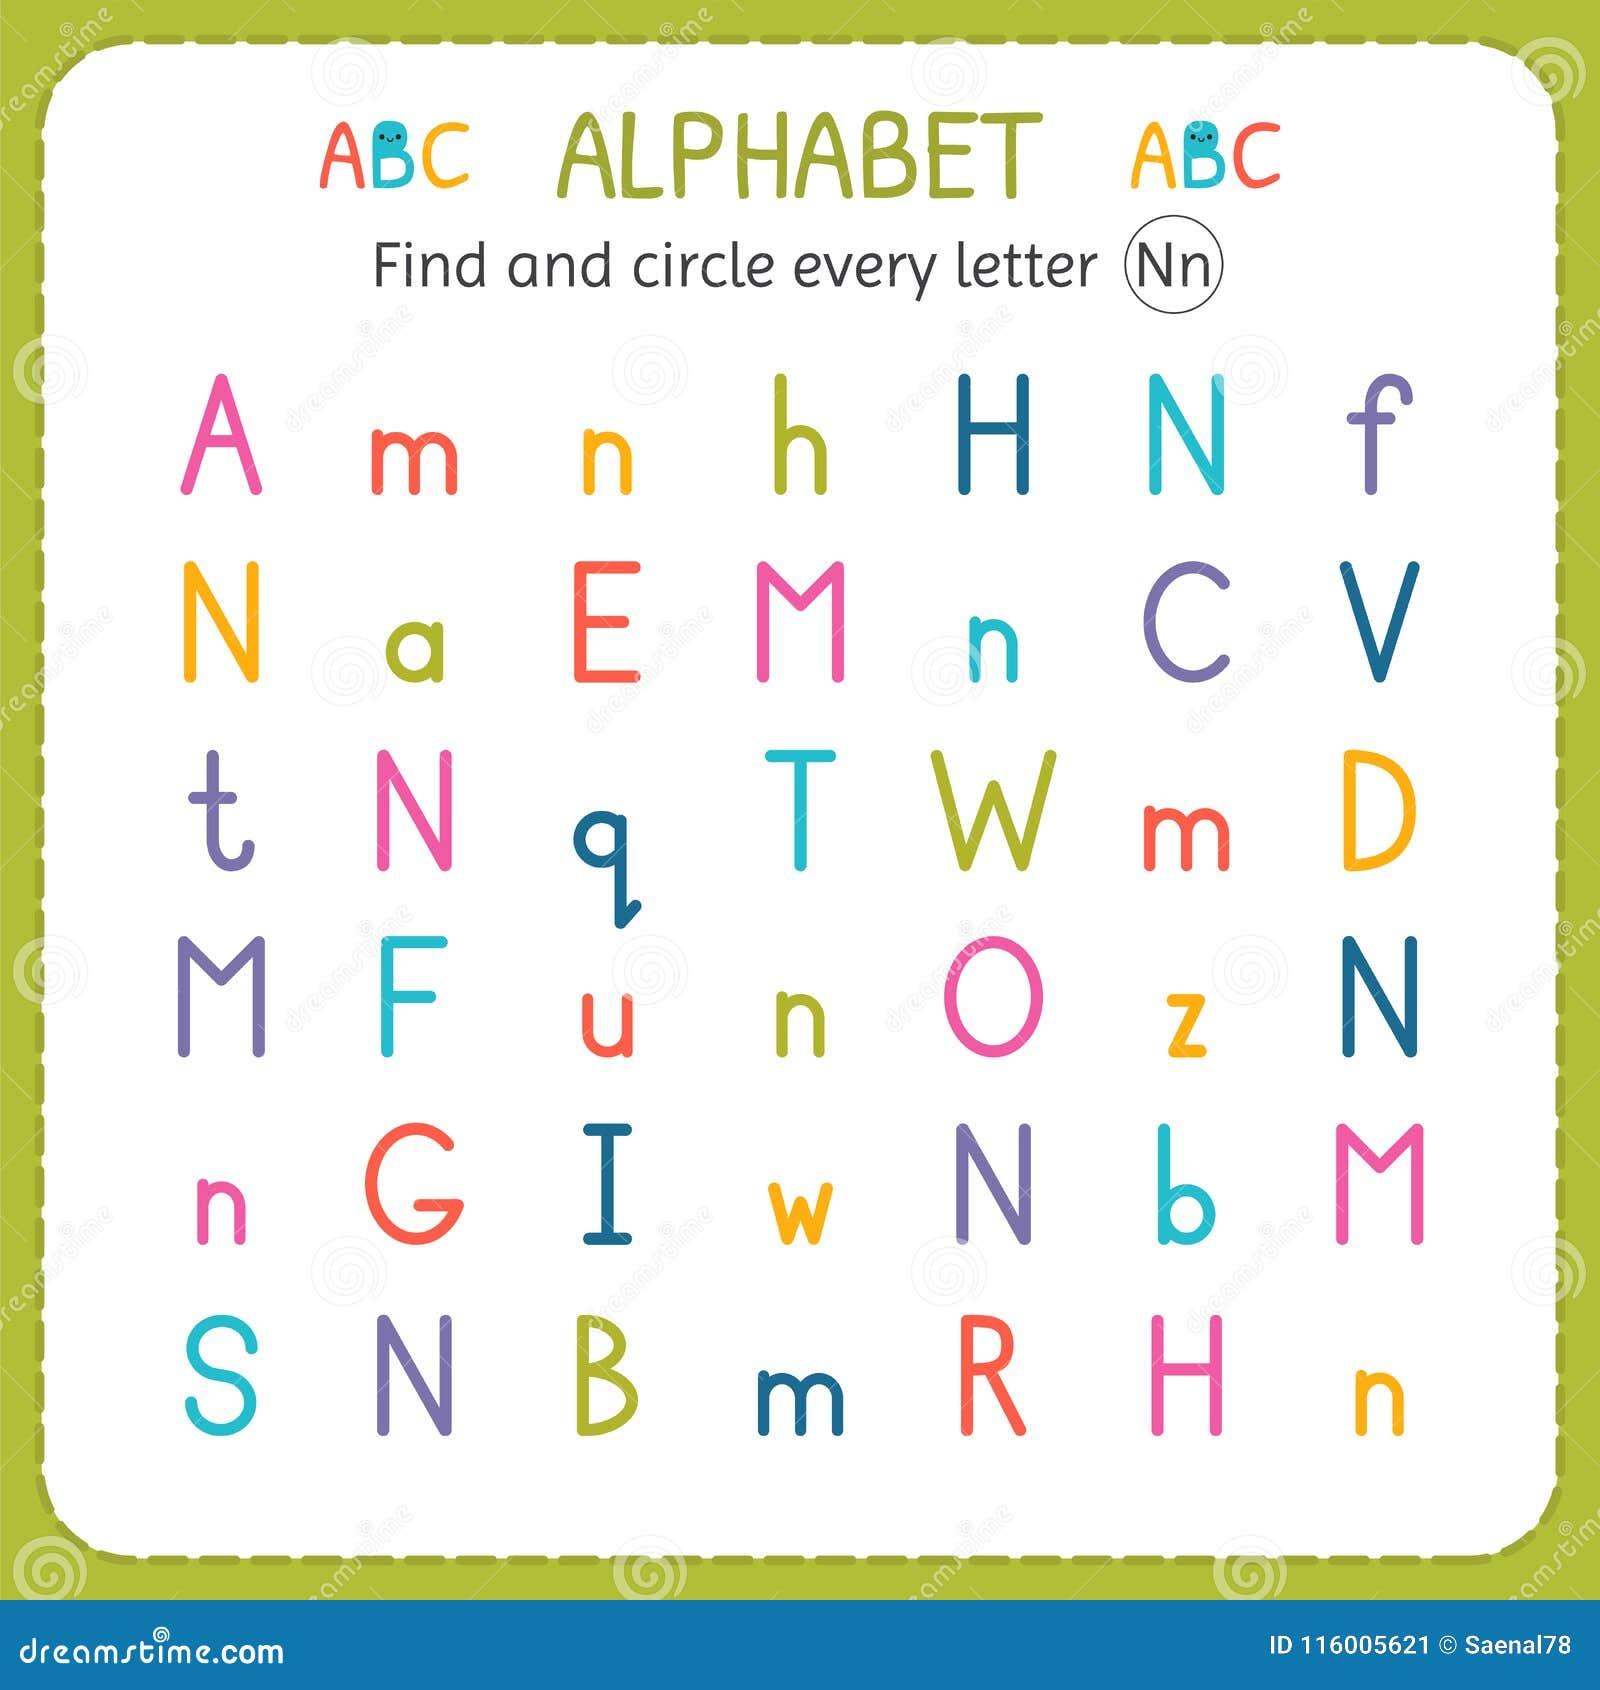 Find And Circle Every Letter N Worksheet For Kindergarten And Preschool Exercises For Children Stock Vector Illustration Of Homework Learn 116005621 - 33+ Free Letter N Worksheets For Kindergarten Gif